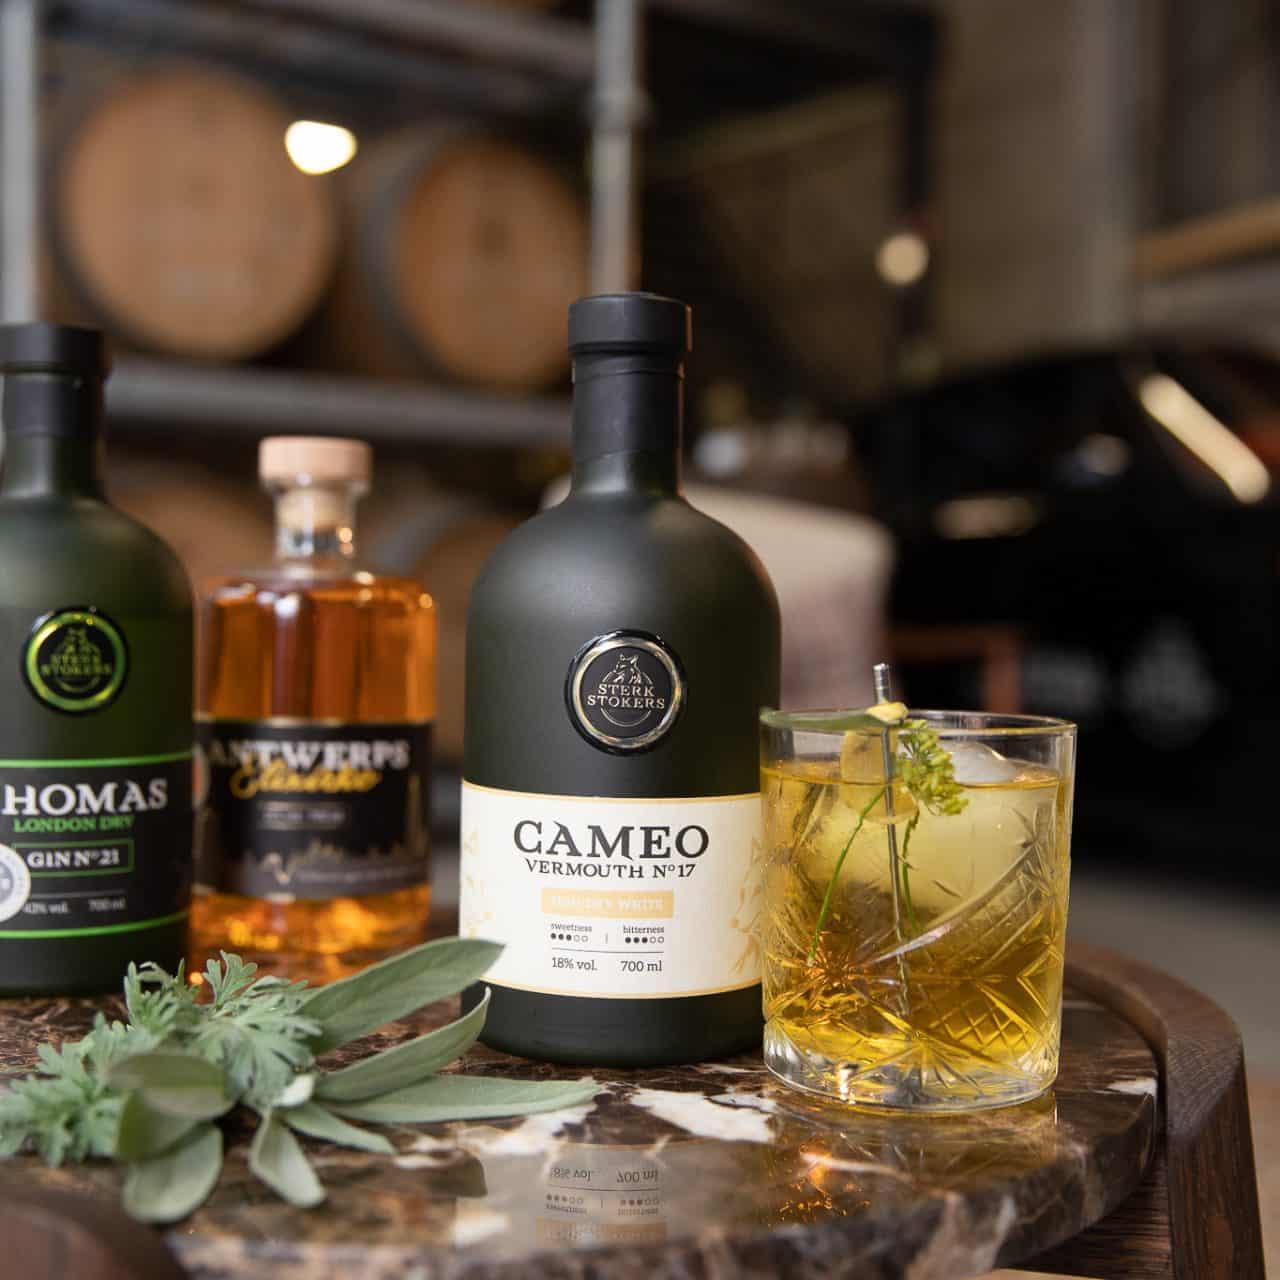 Cameo Vermouth 17 van Sterkstokers met glas